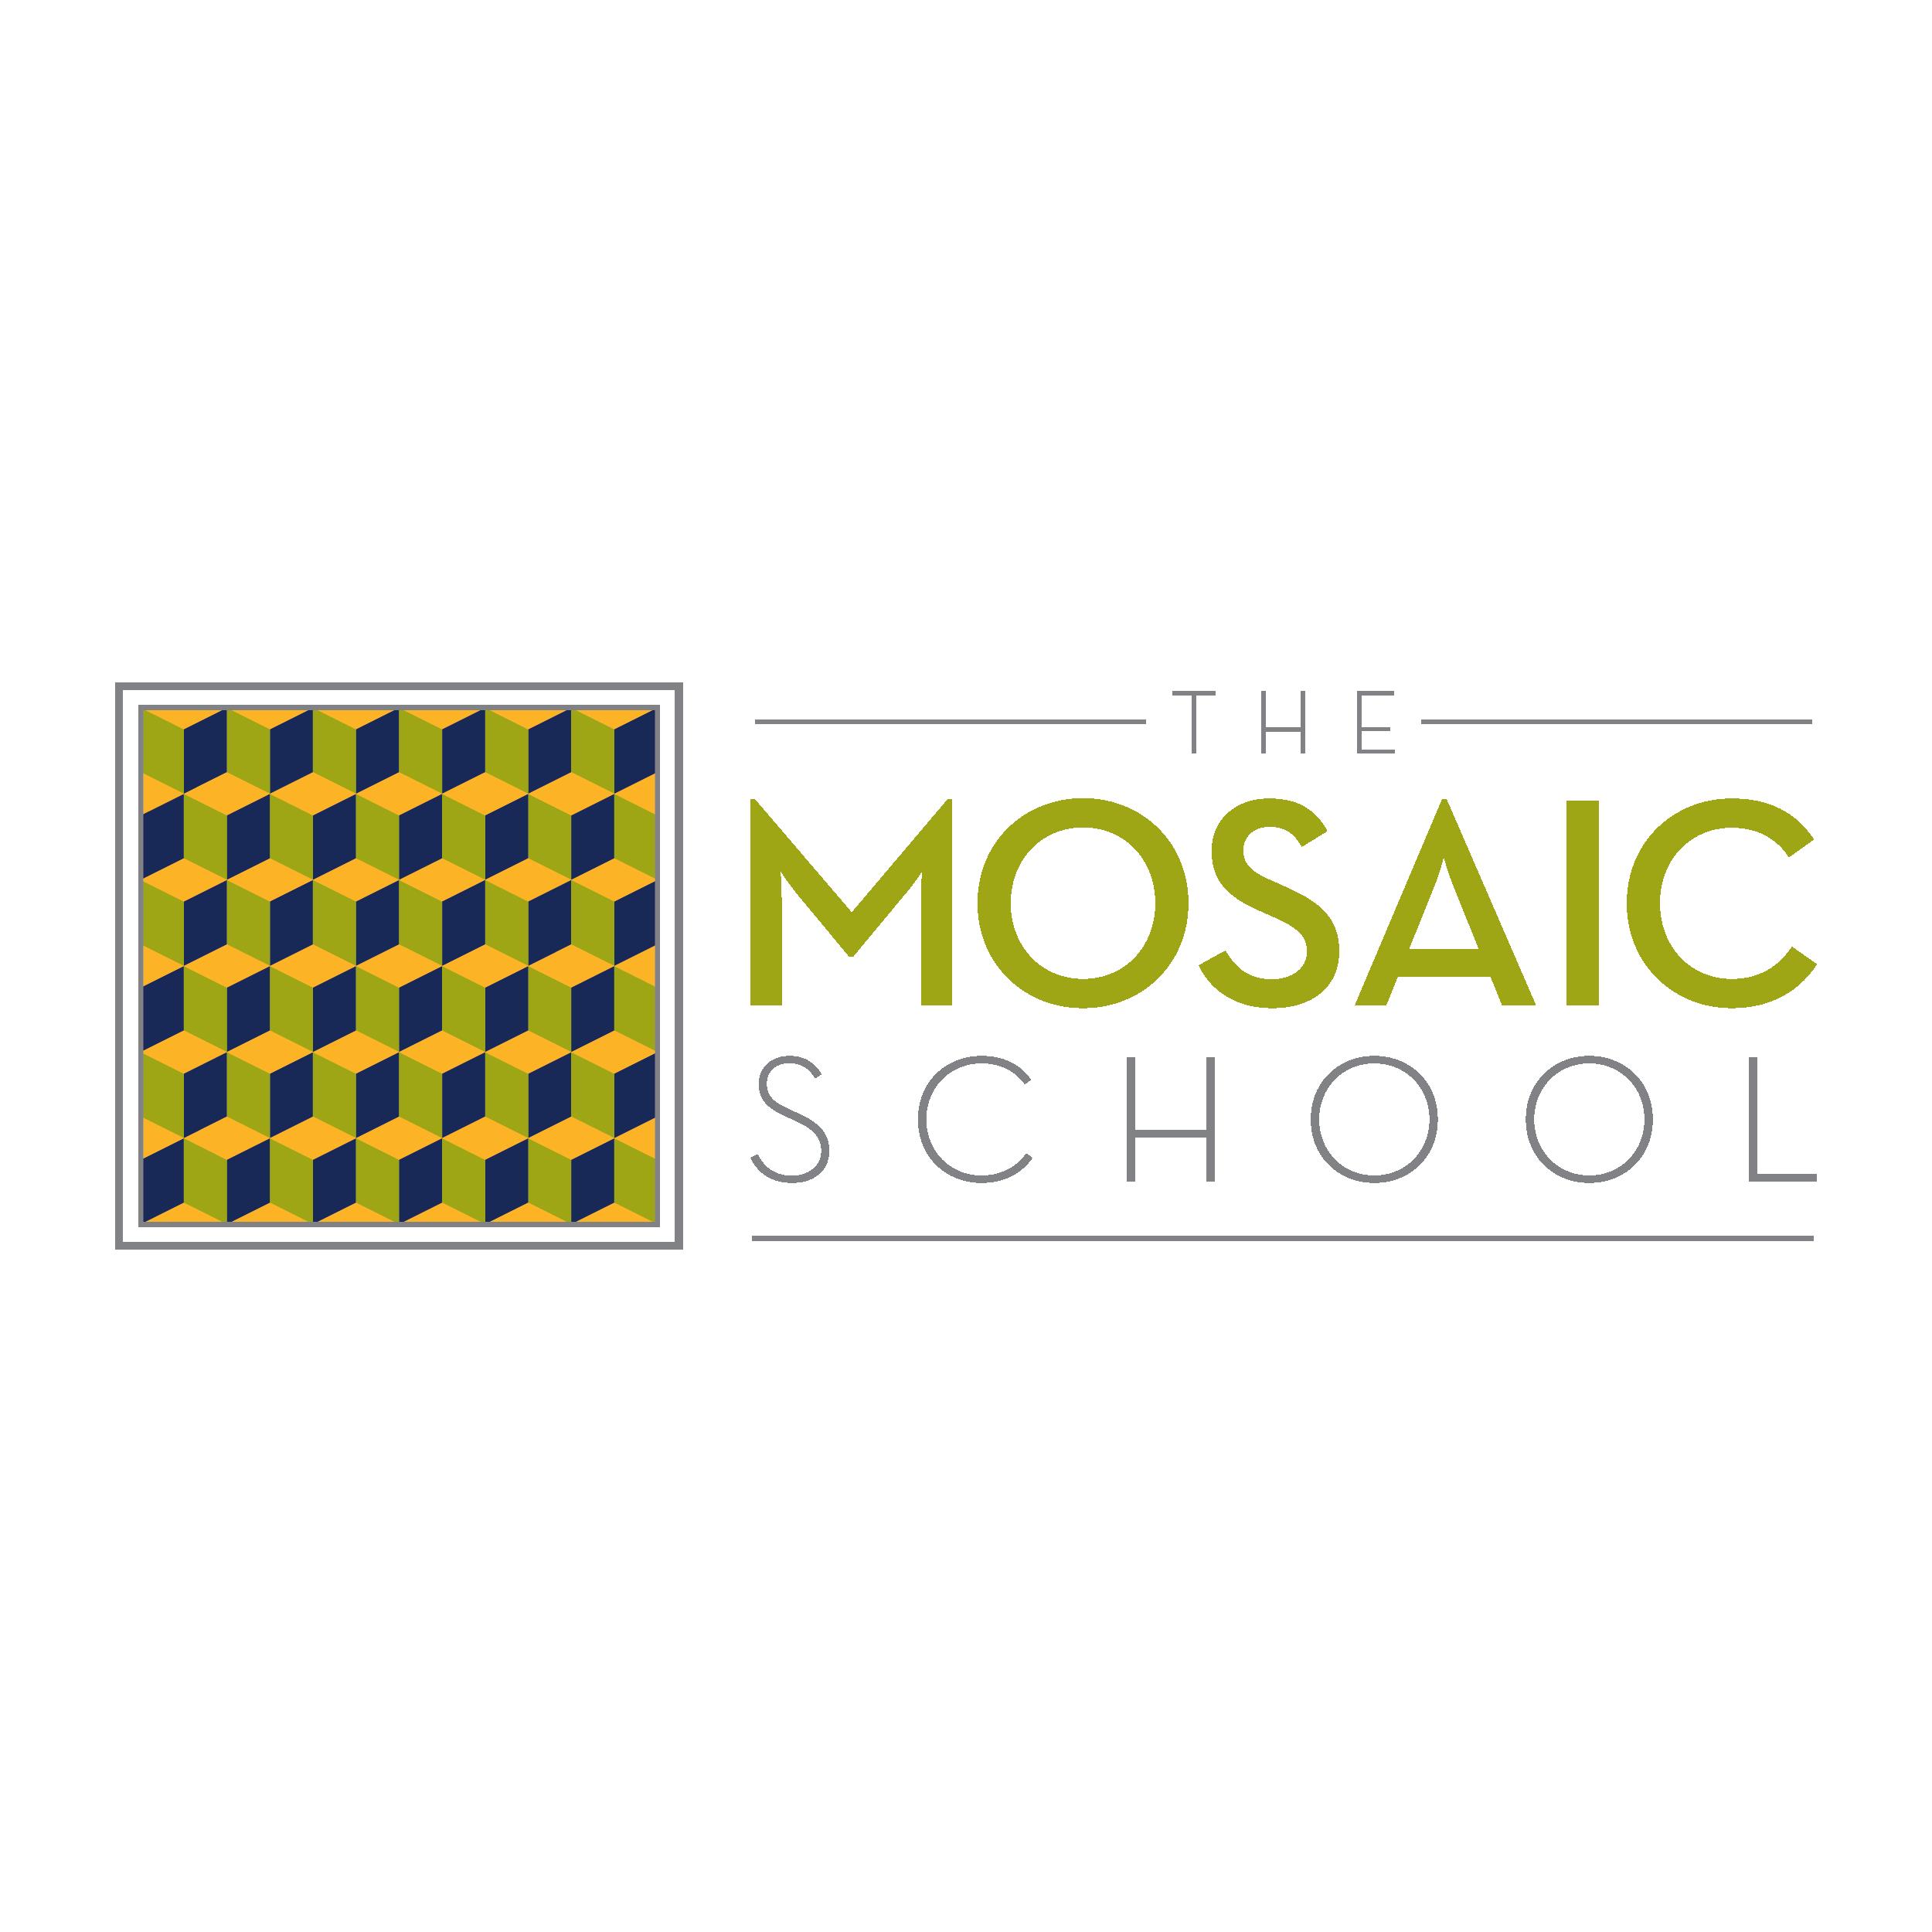 The Mosaic School